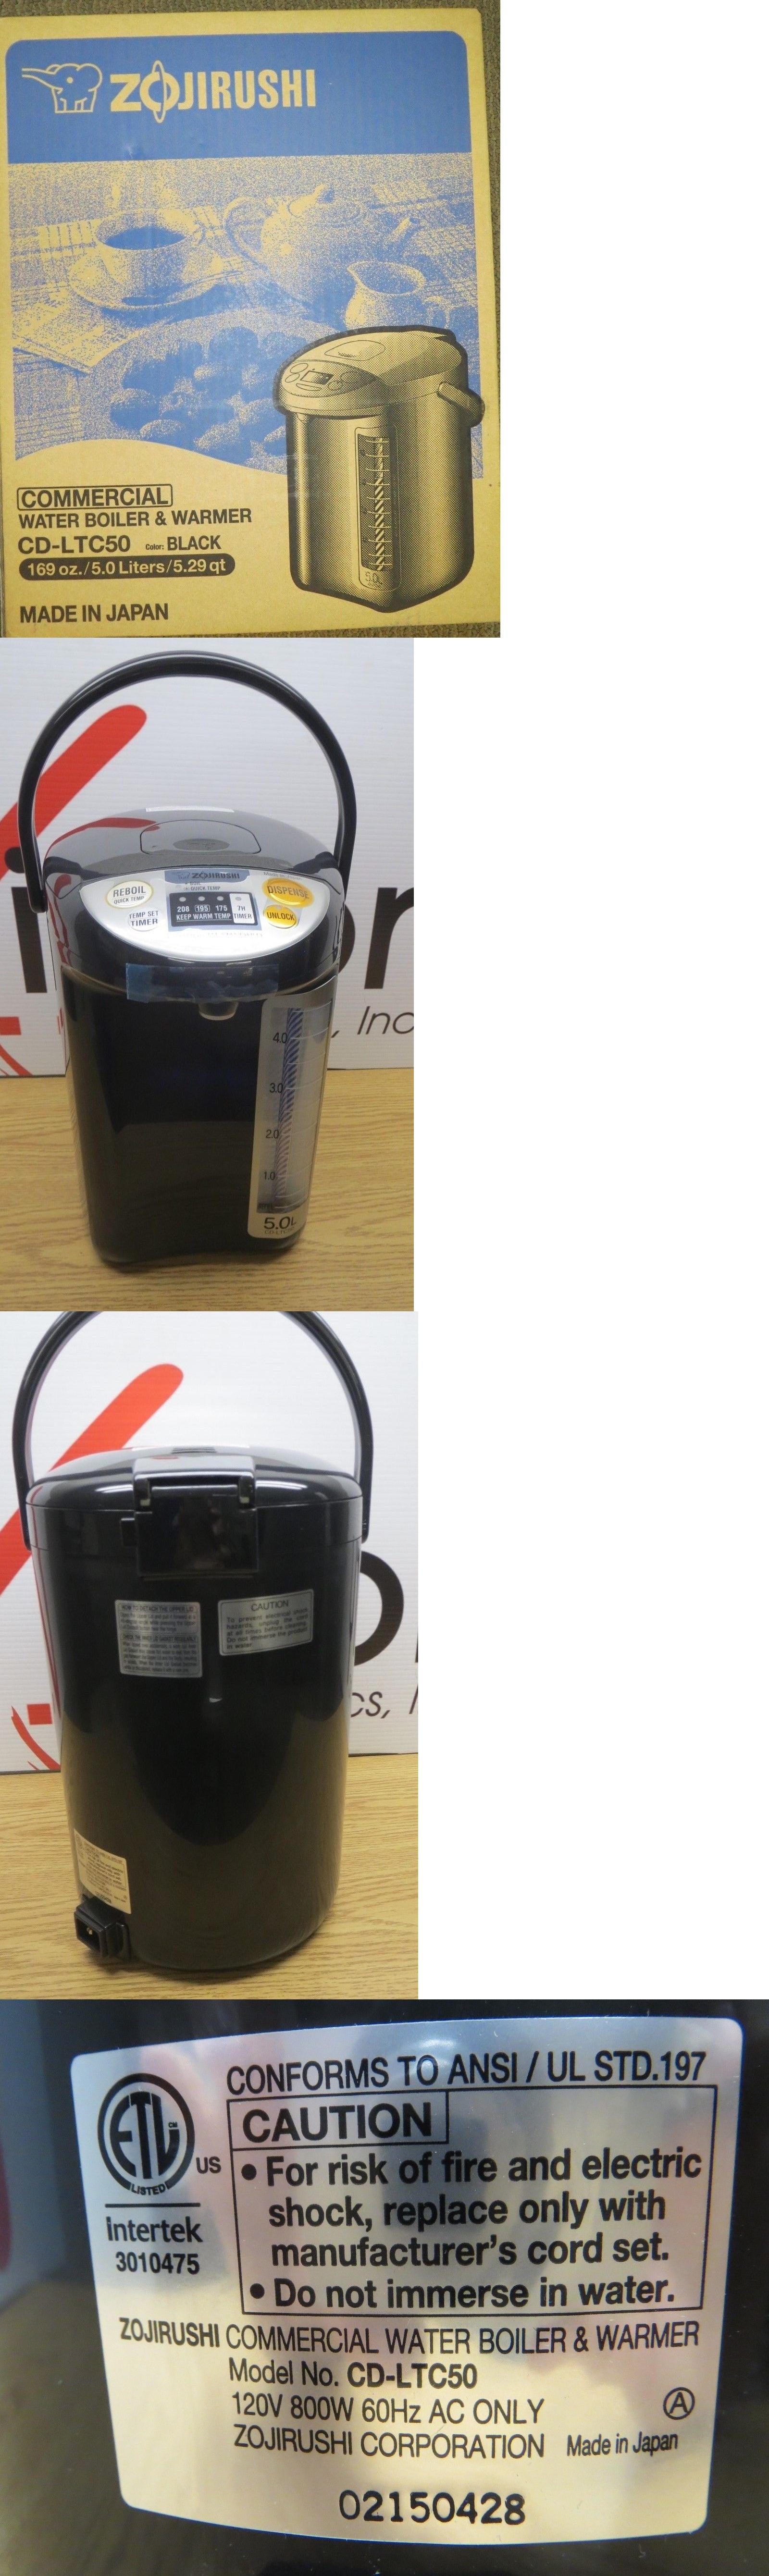 Hot Water Pots 177755: Nob Zojirushi Cd-Ltc50-Ba Commercial Water ...